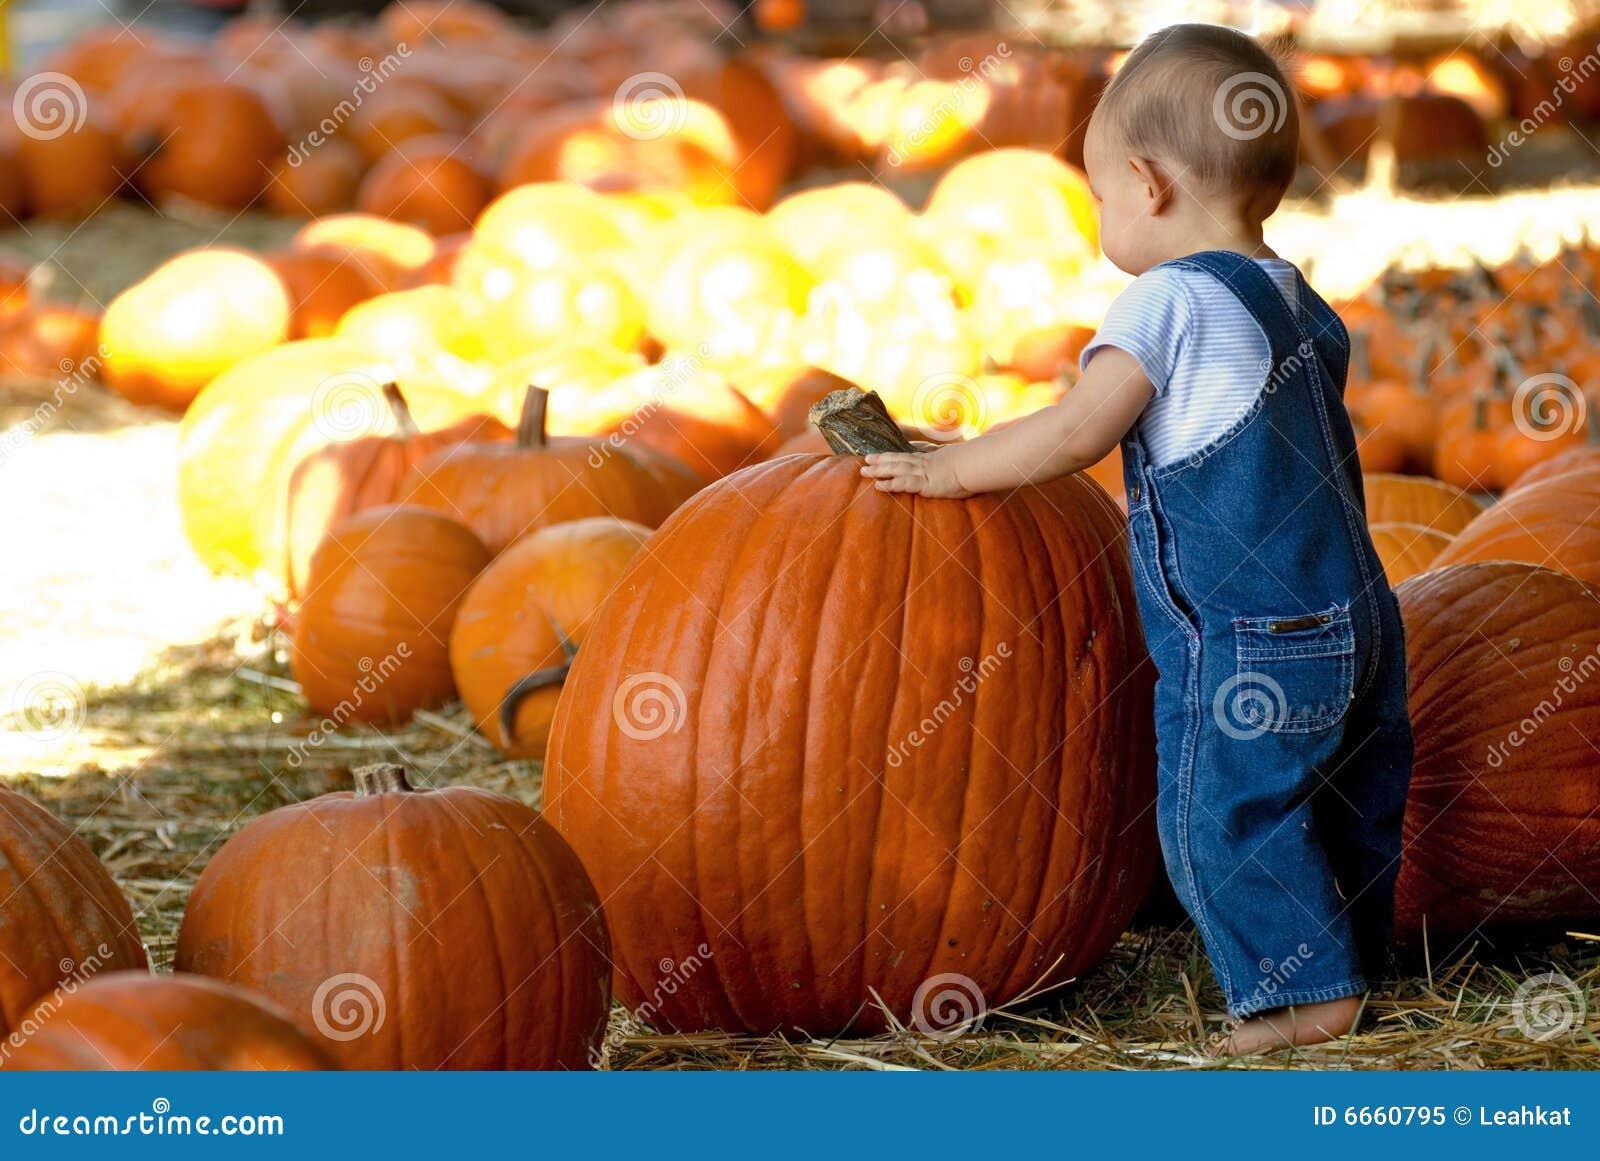 Small Boy Finds Large Pumpkin